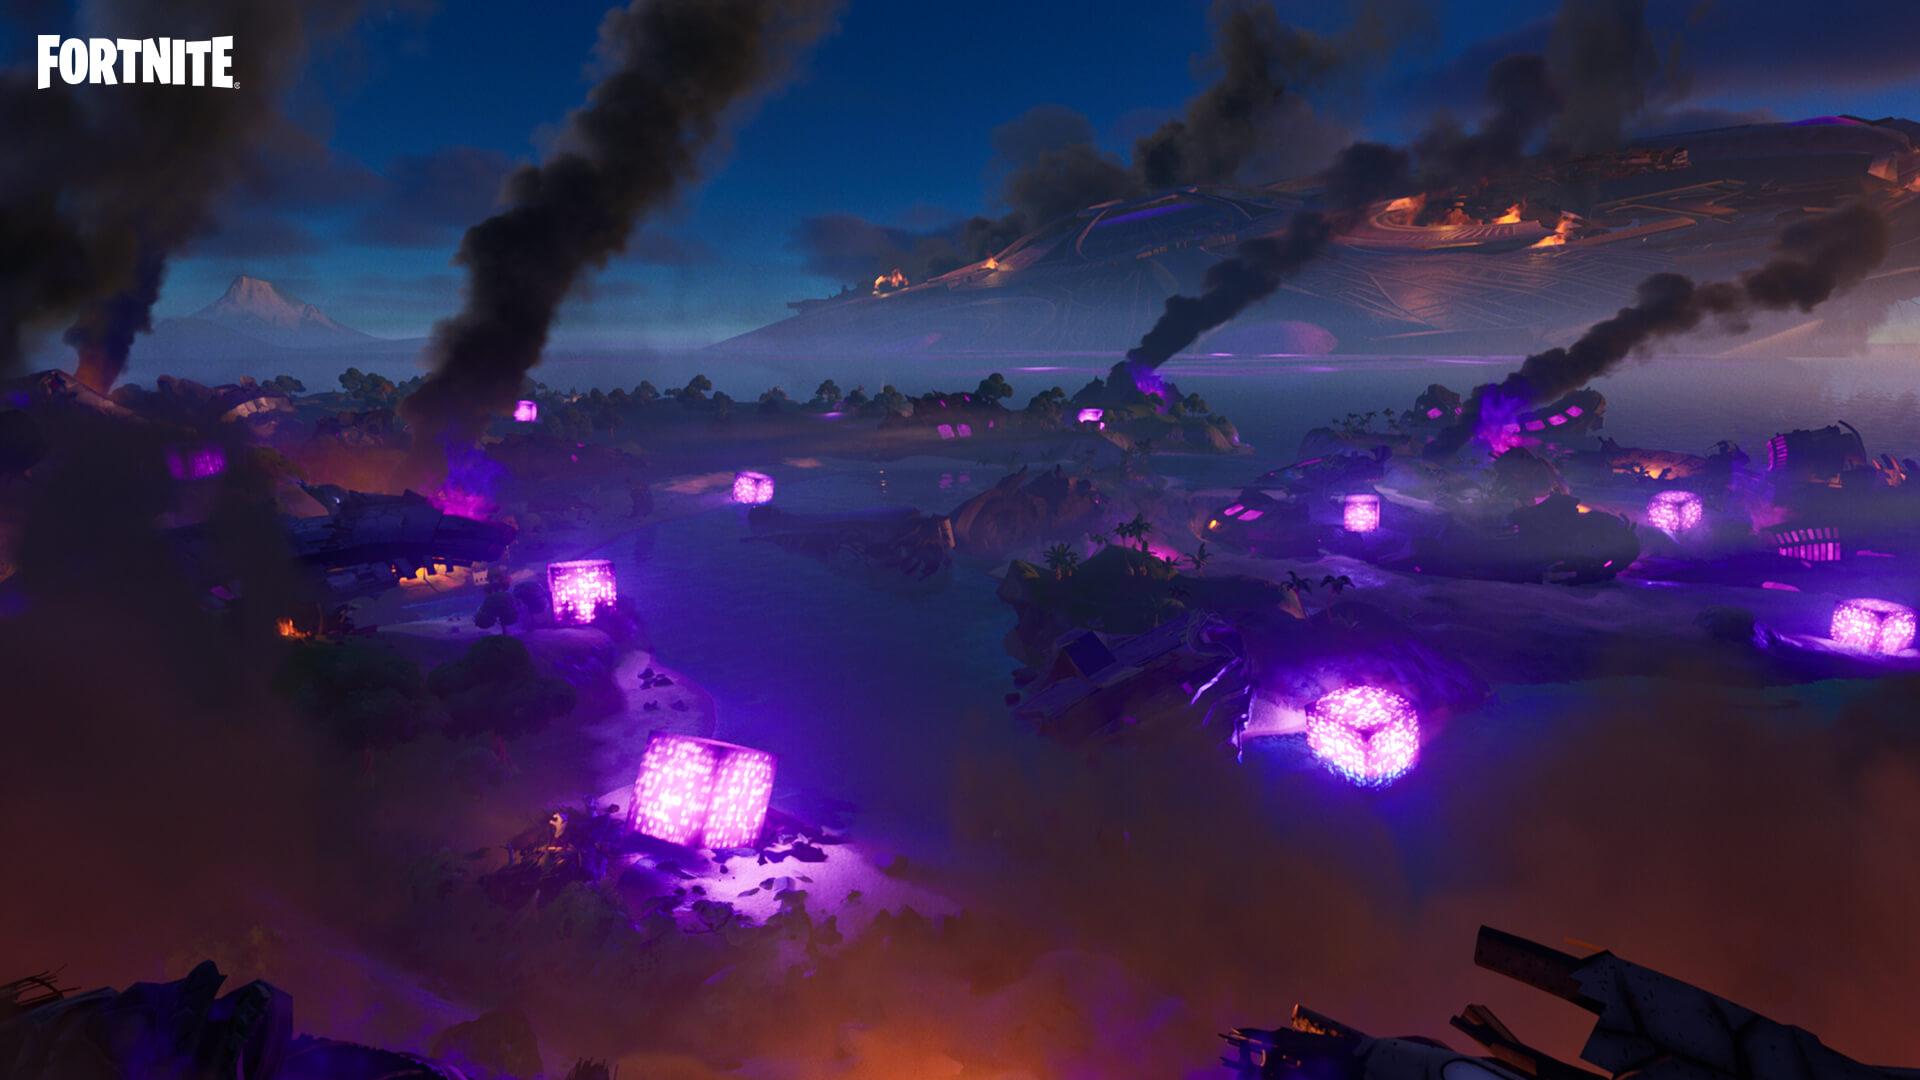 Fortnite: The Believer Beach Cube has been Awakened